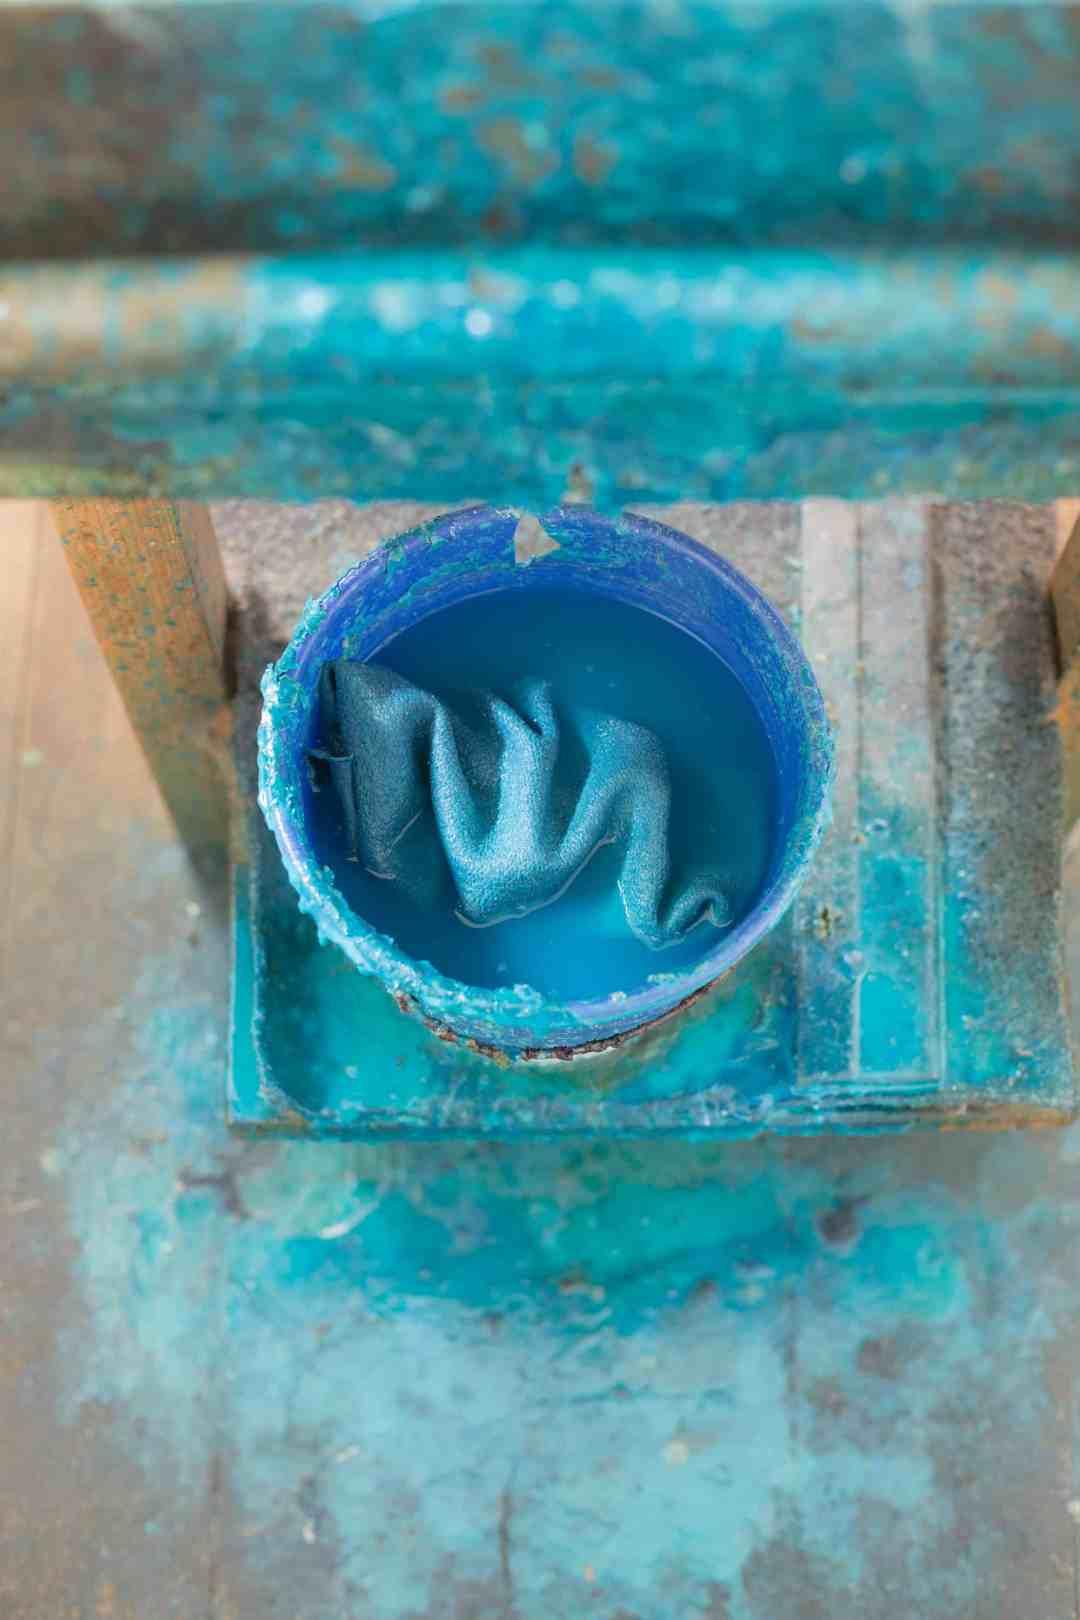 Blue Innovations, Olesnice, photo: Tomas Brabec